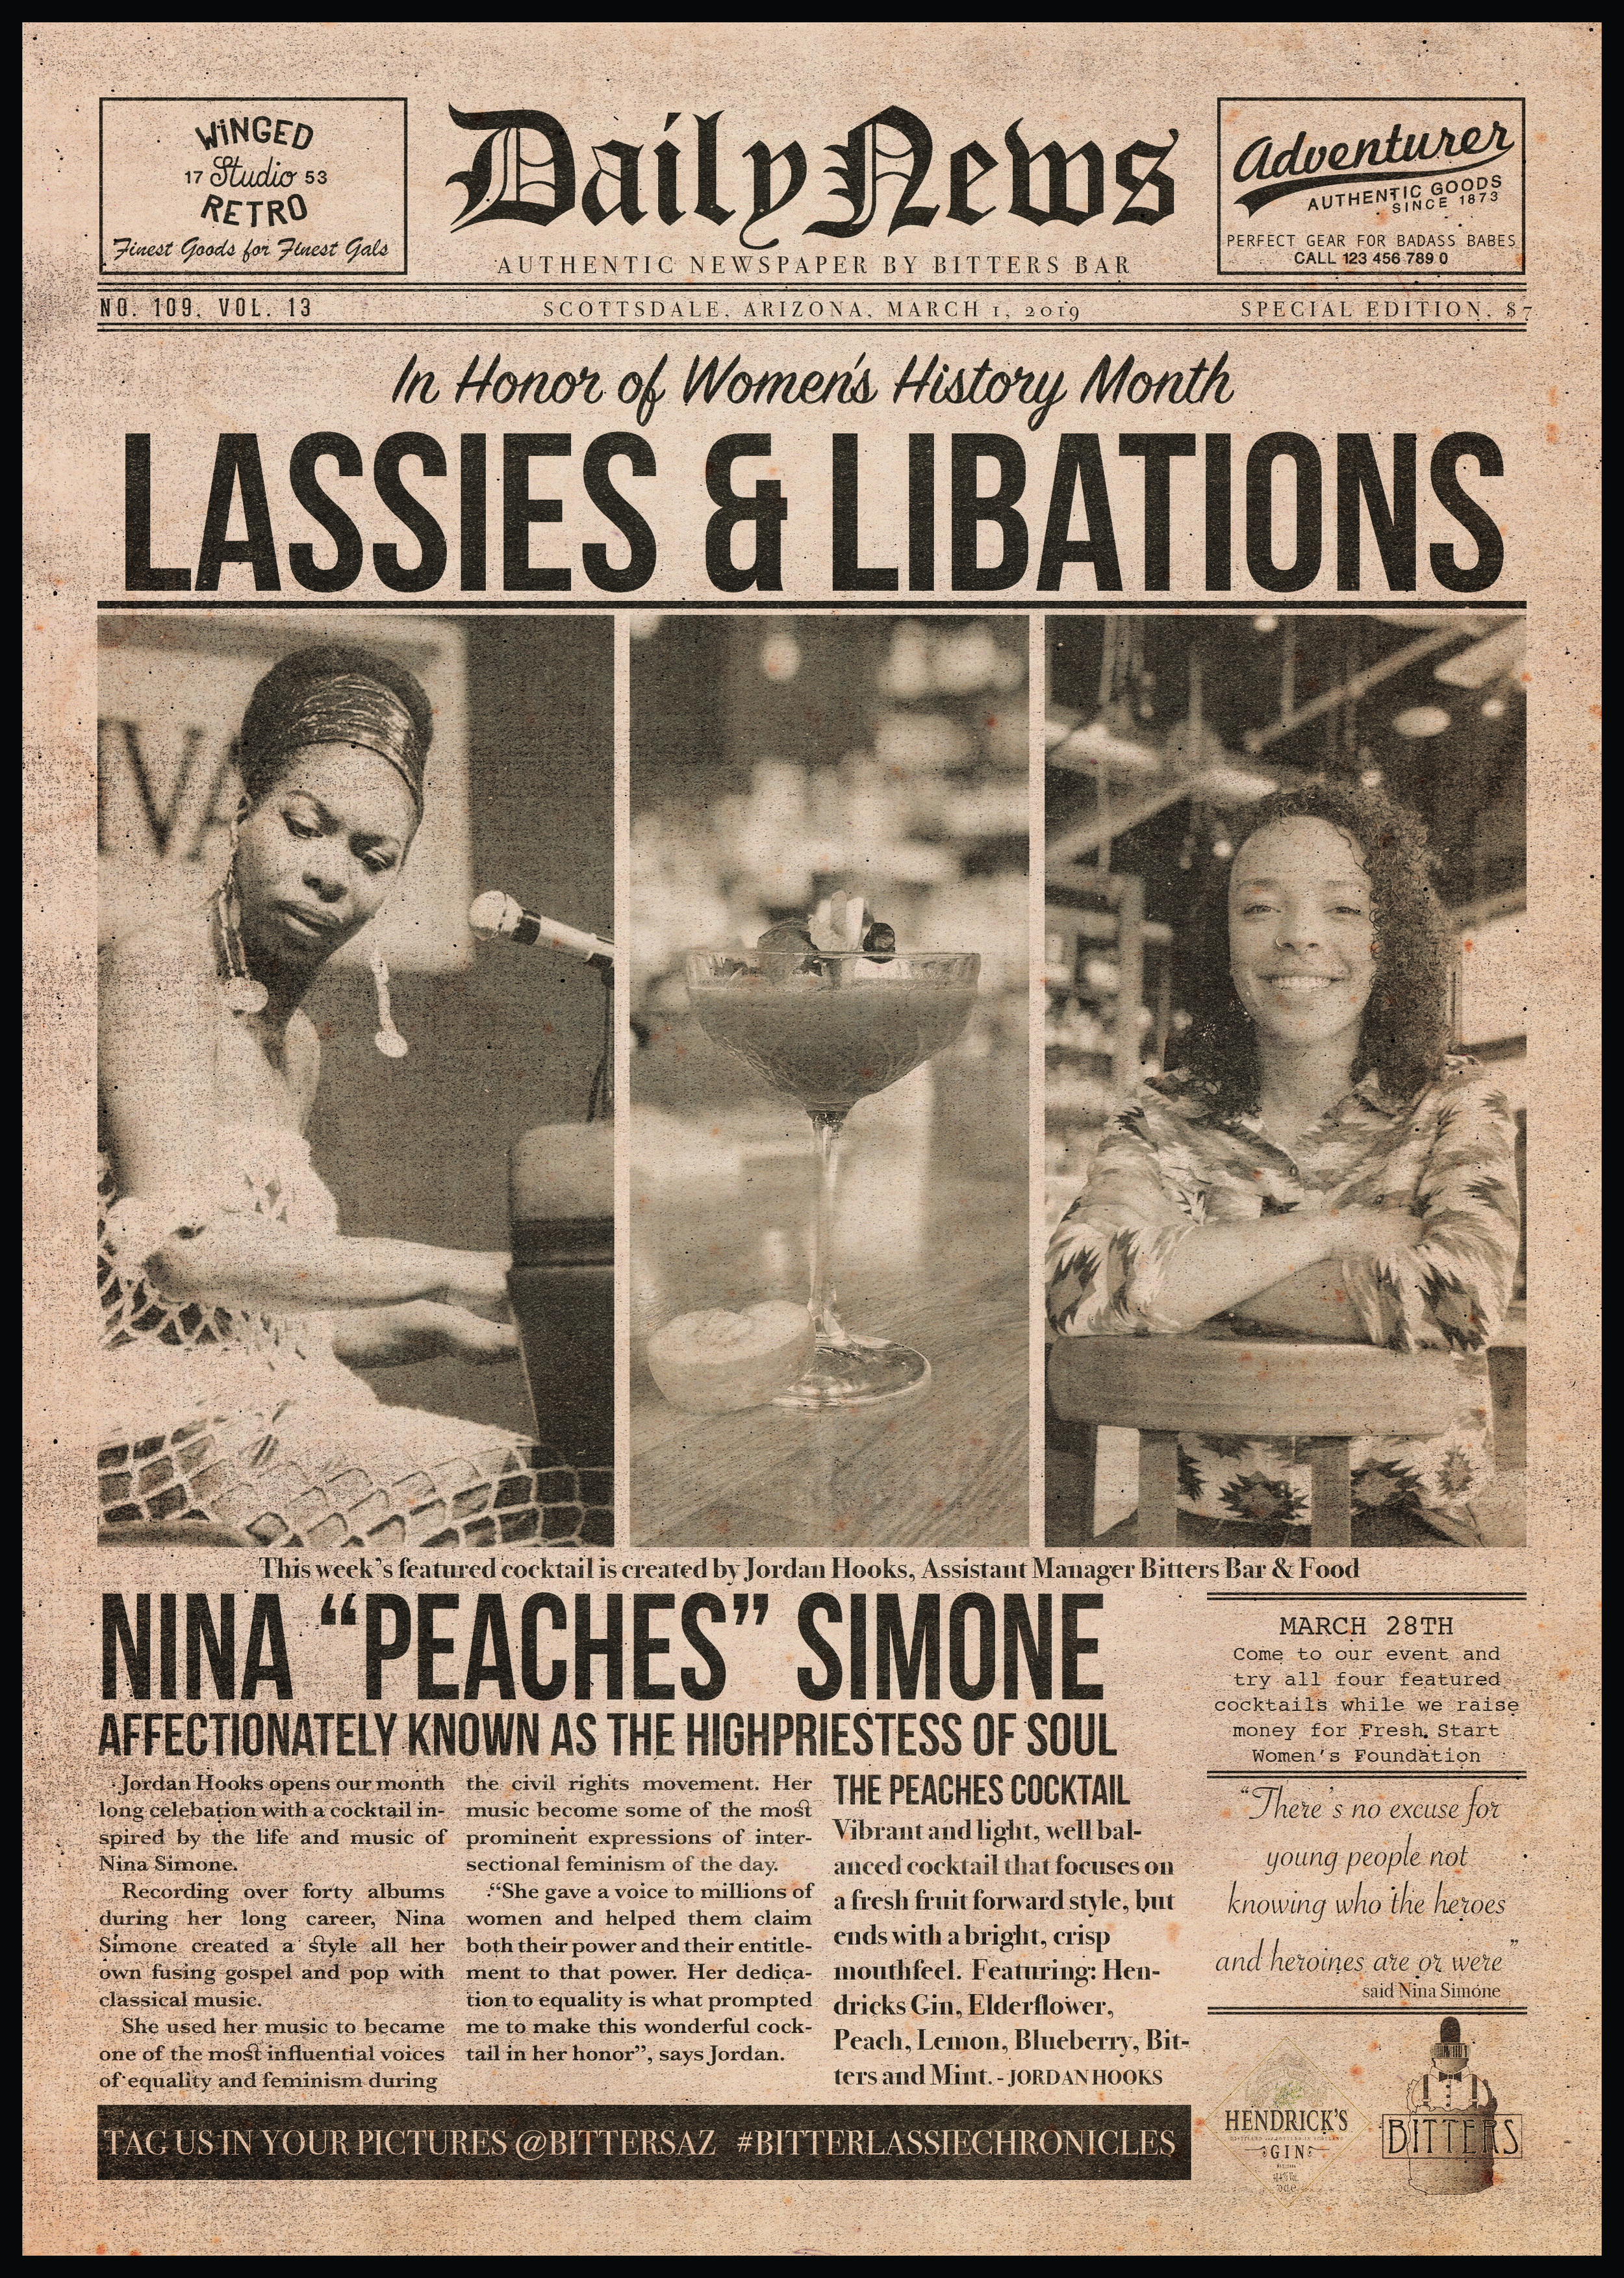 "Week one ""newspaper"" featuring Nina Simone, Jordan Hooks and her cocktail honoring Nina Simone."